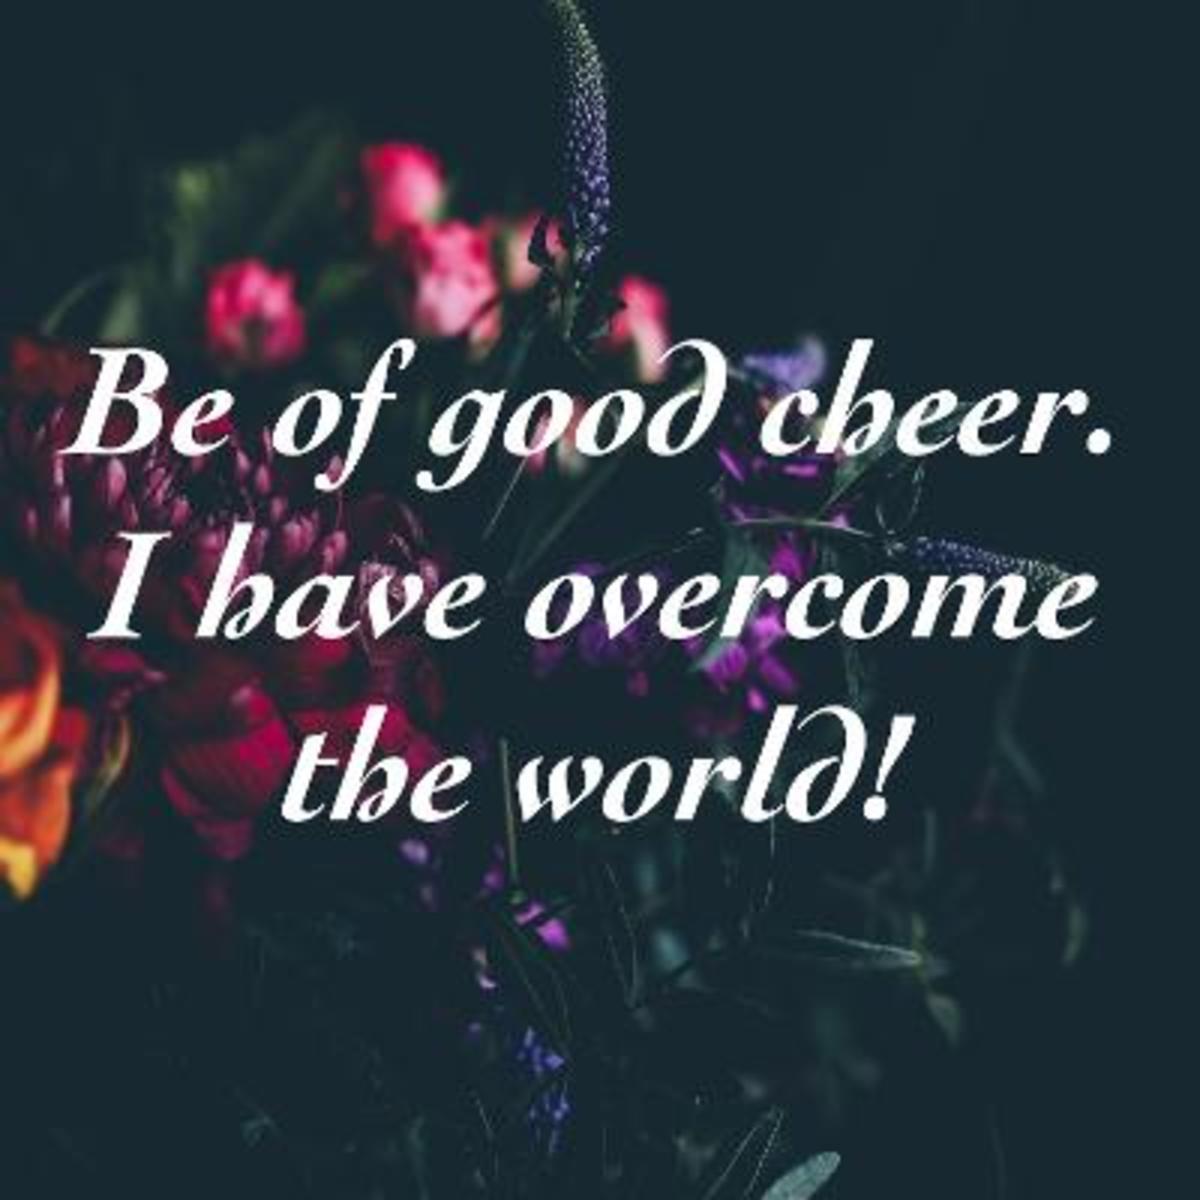 reasons-to-be-of-good-cheer